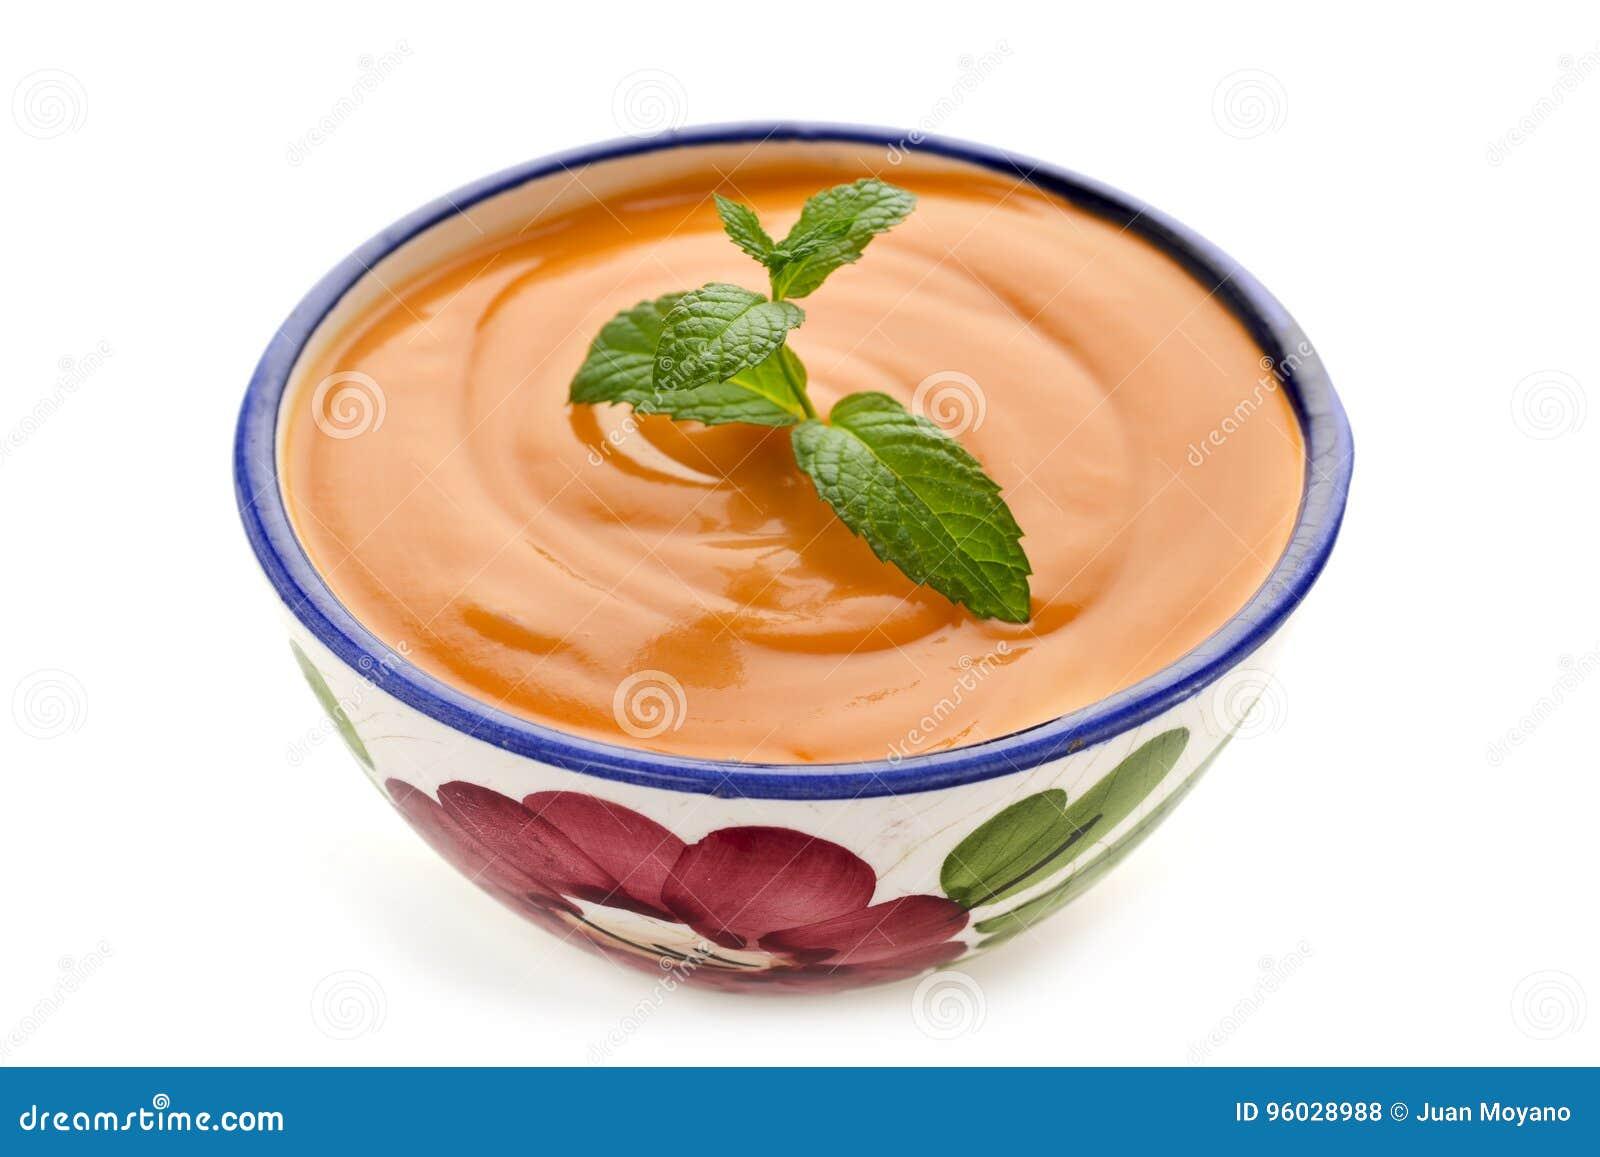 Hiszpański porra antequerana, zimna pomidorowa polewka